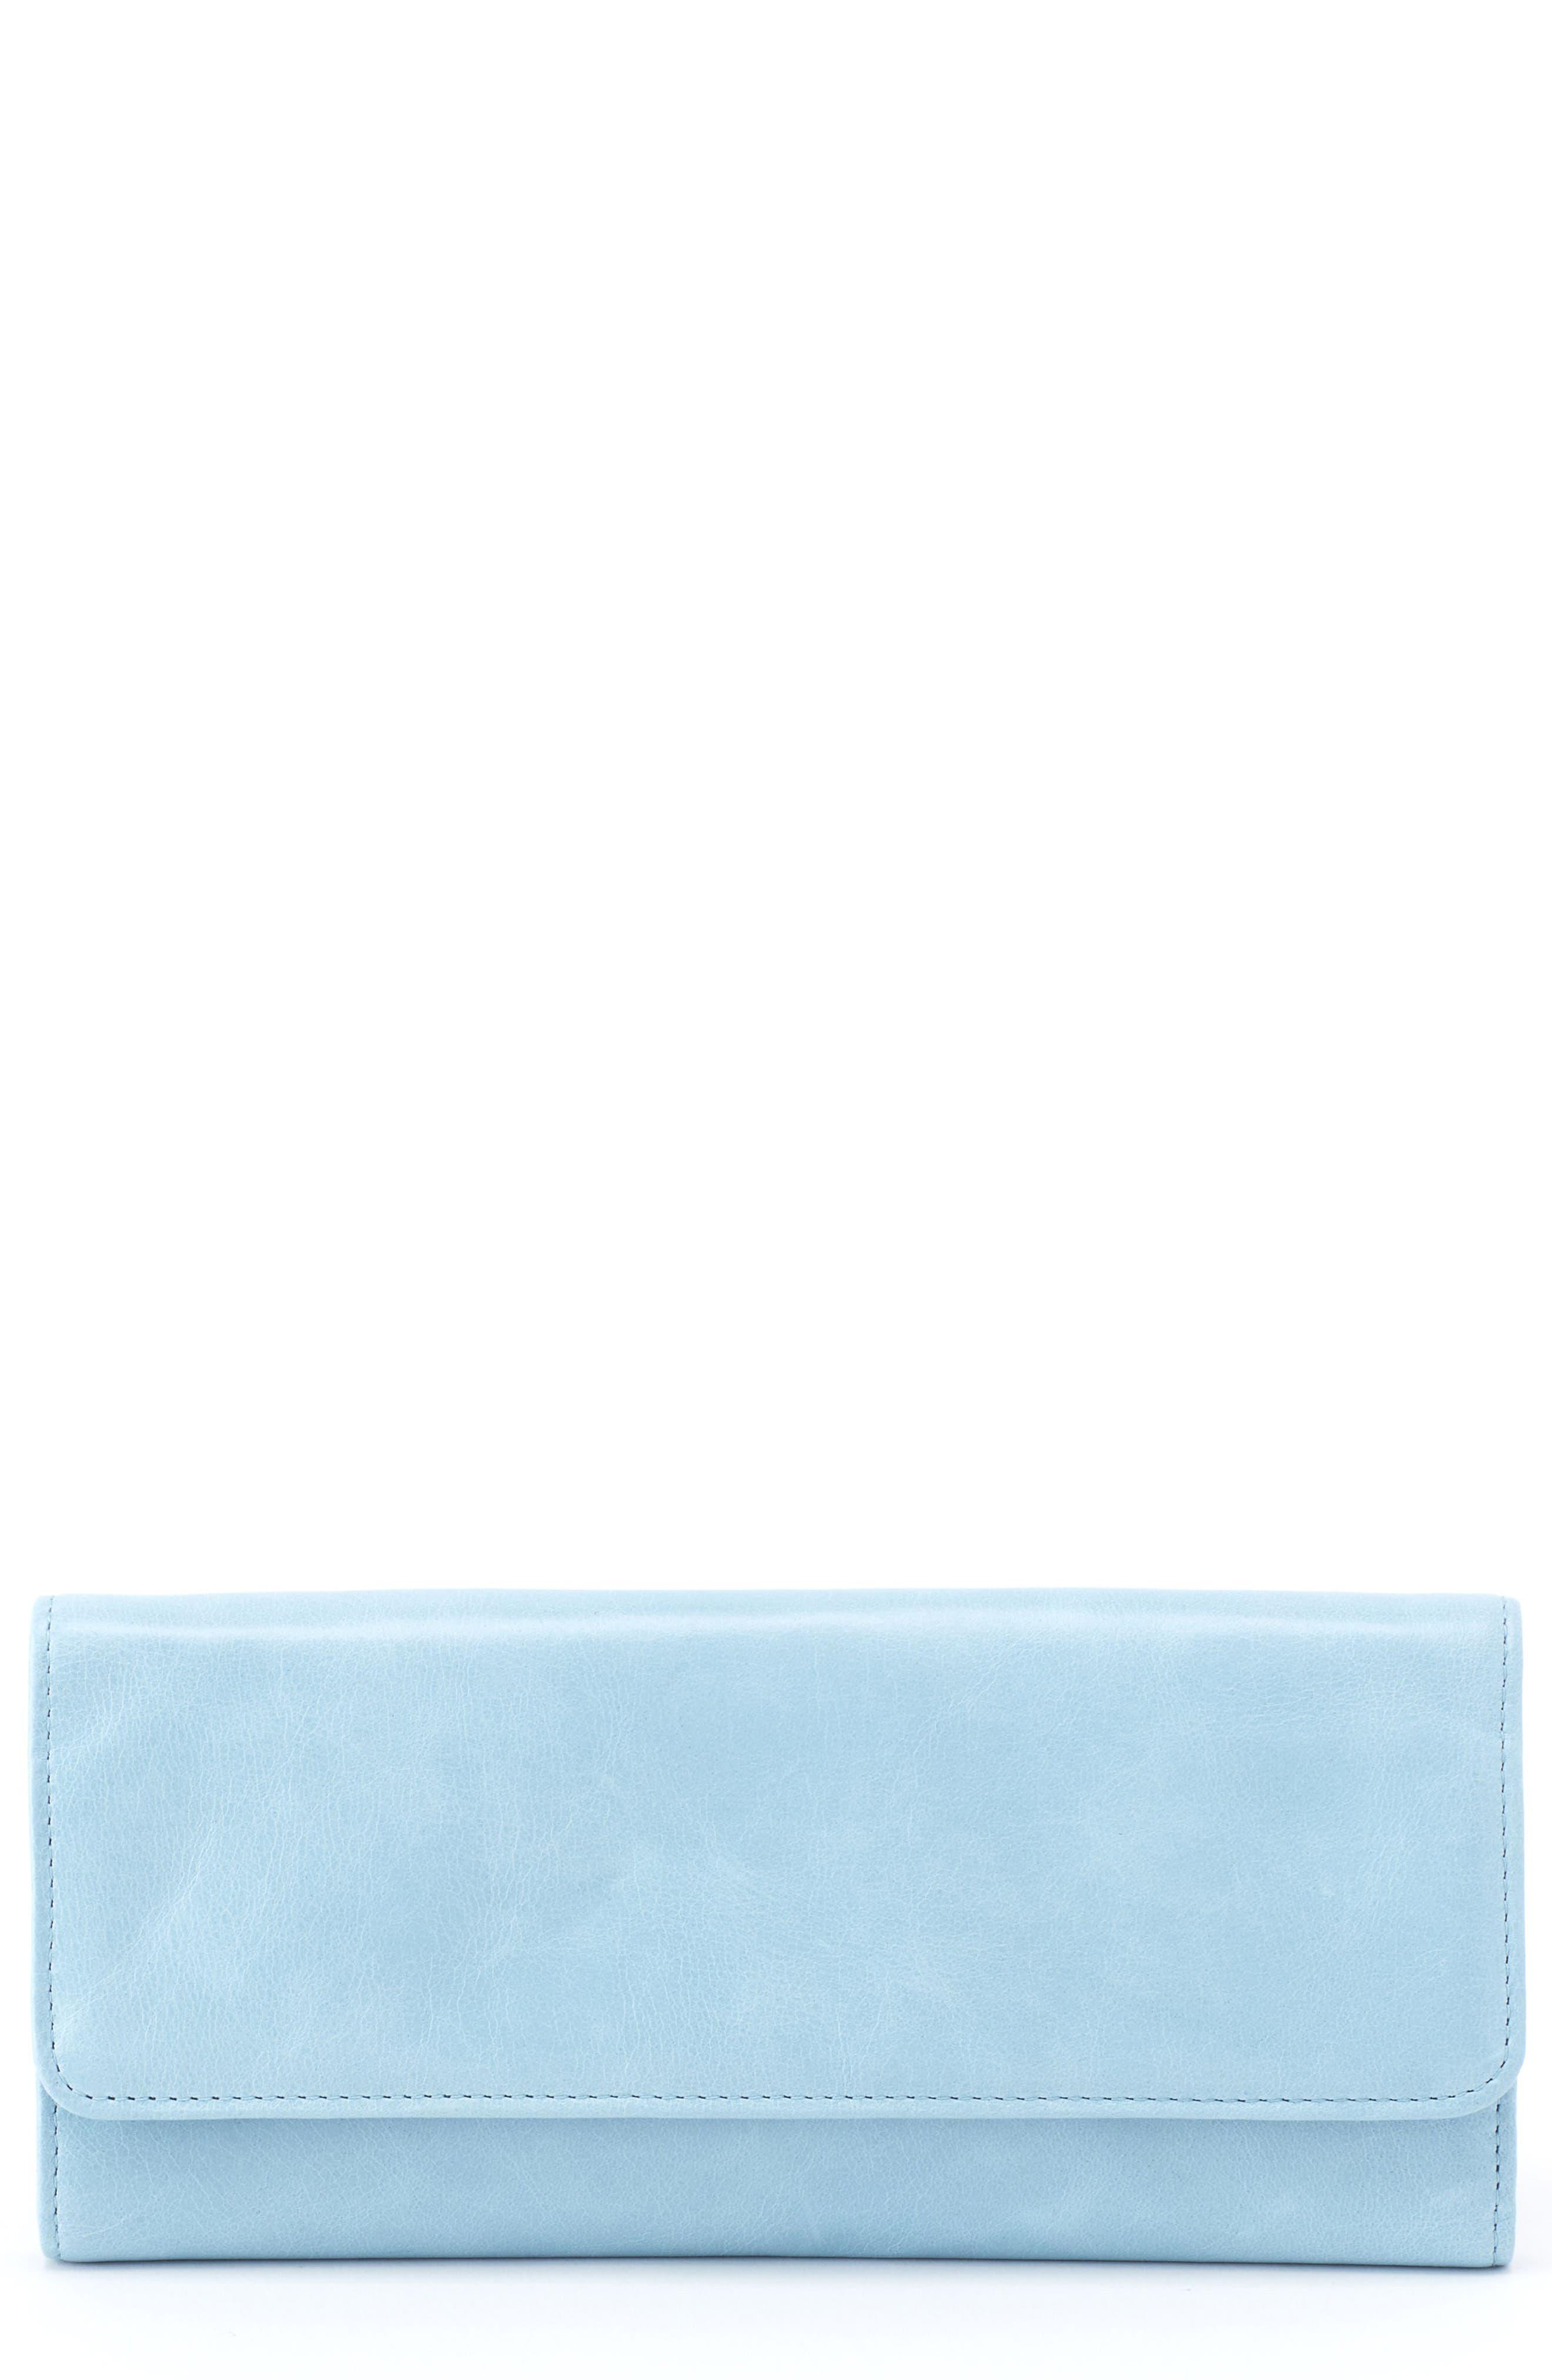 'Sadie' Leather Wallet,                             Main thumbnail 7, color,